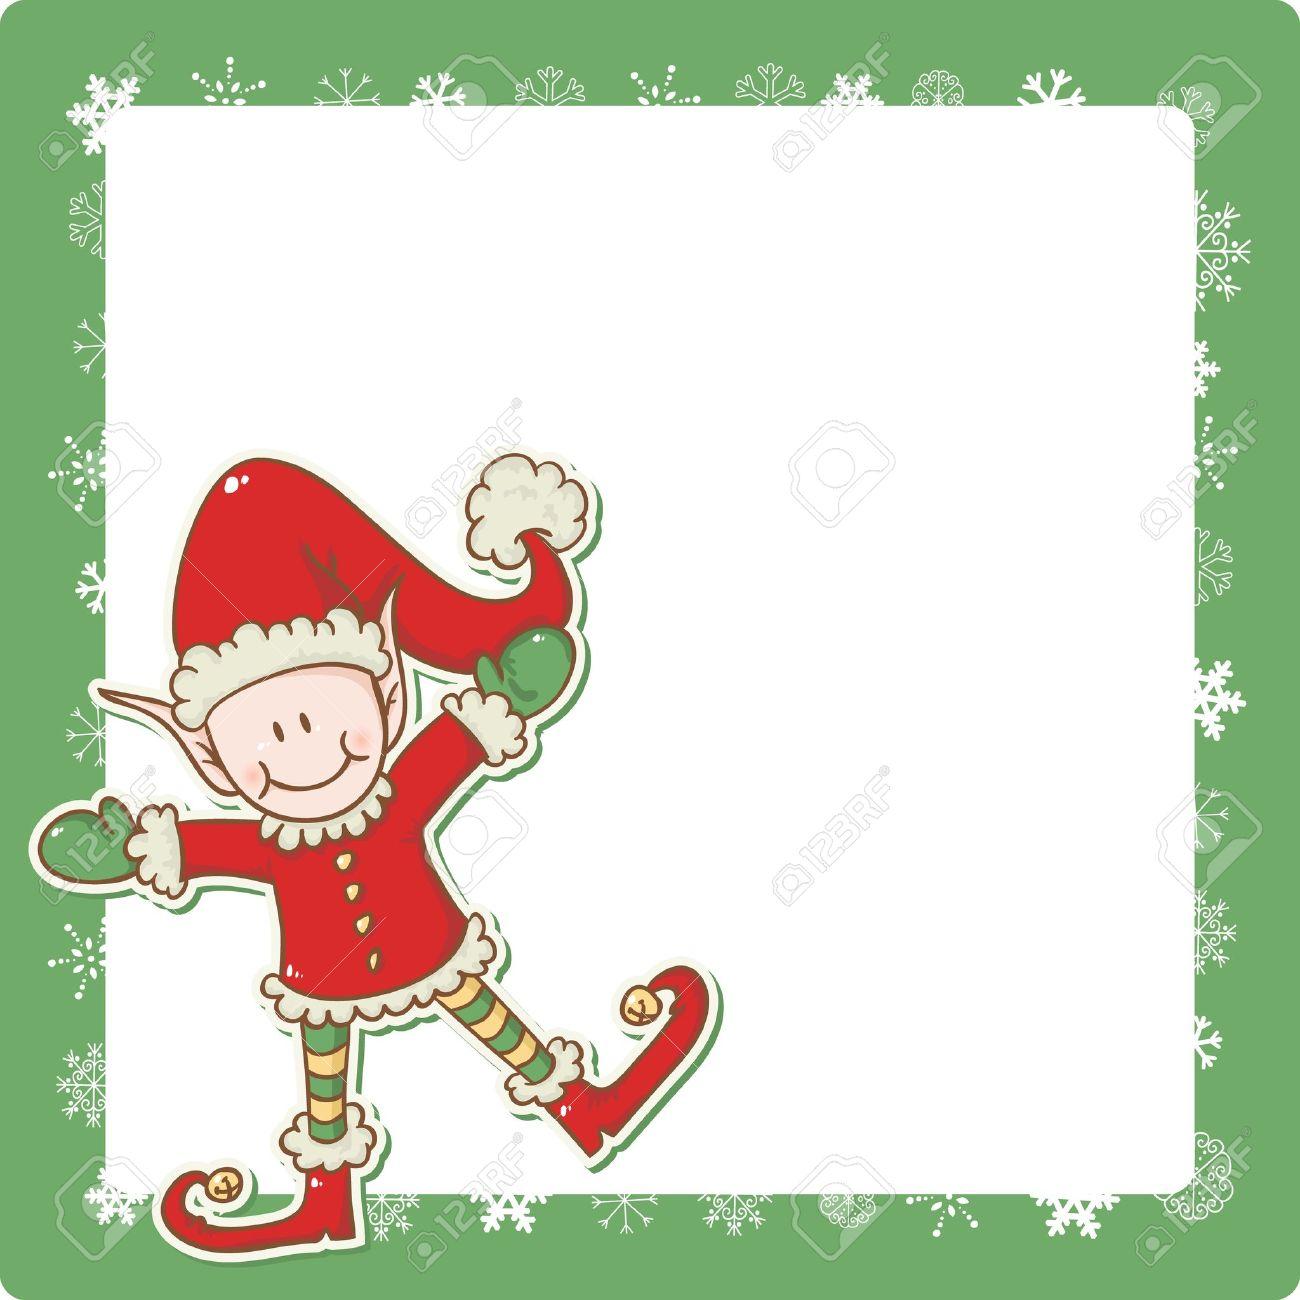 christmas card with cute little elf santa helper royalty free